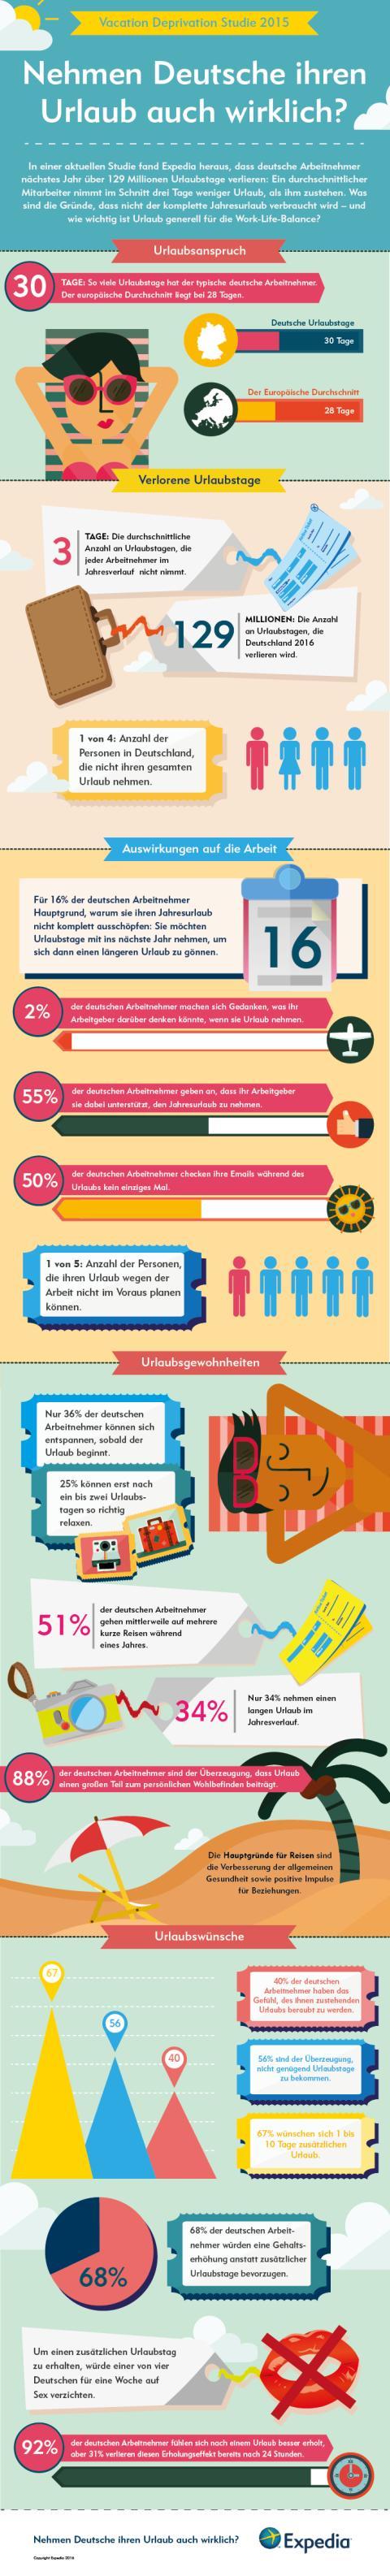 Expedia Vacation Deprivation Studie 2015_Infografik